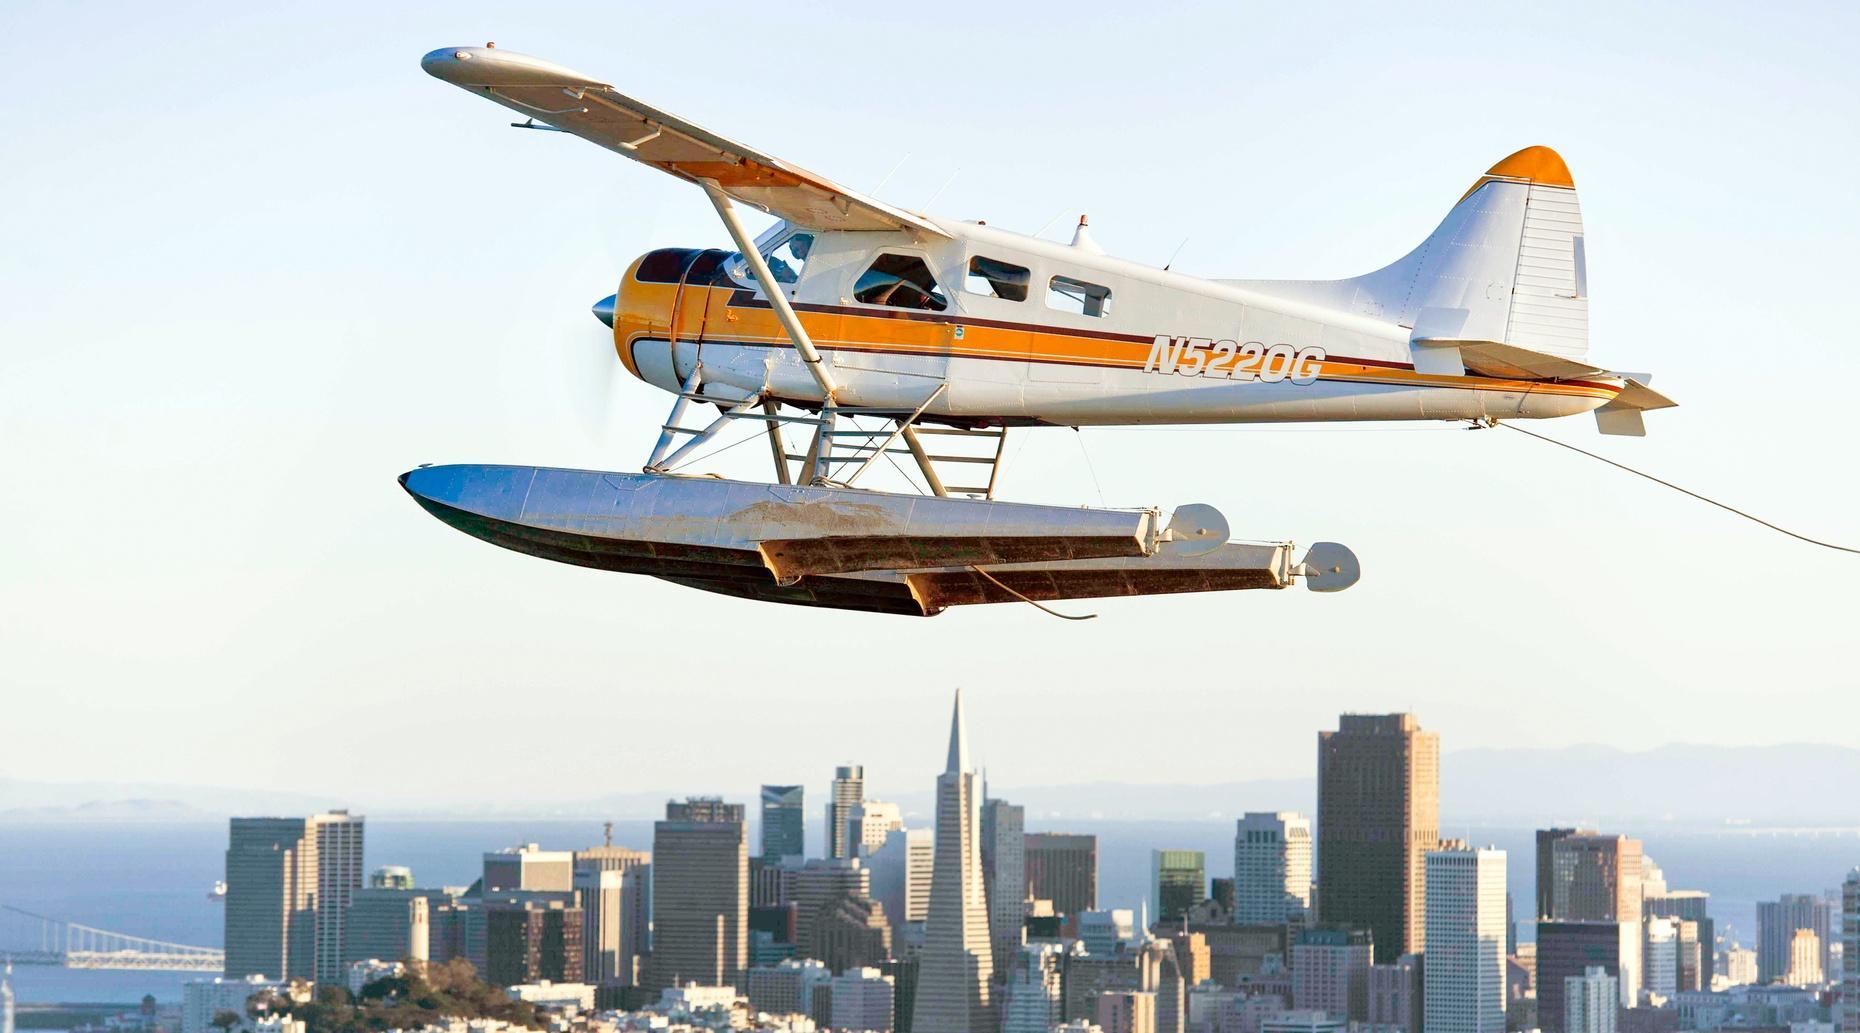 Golden Gate Seaplane Tour